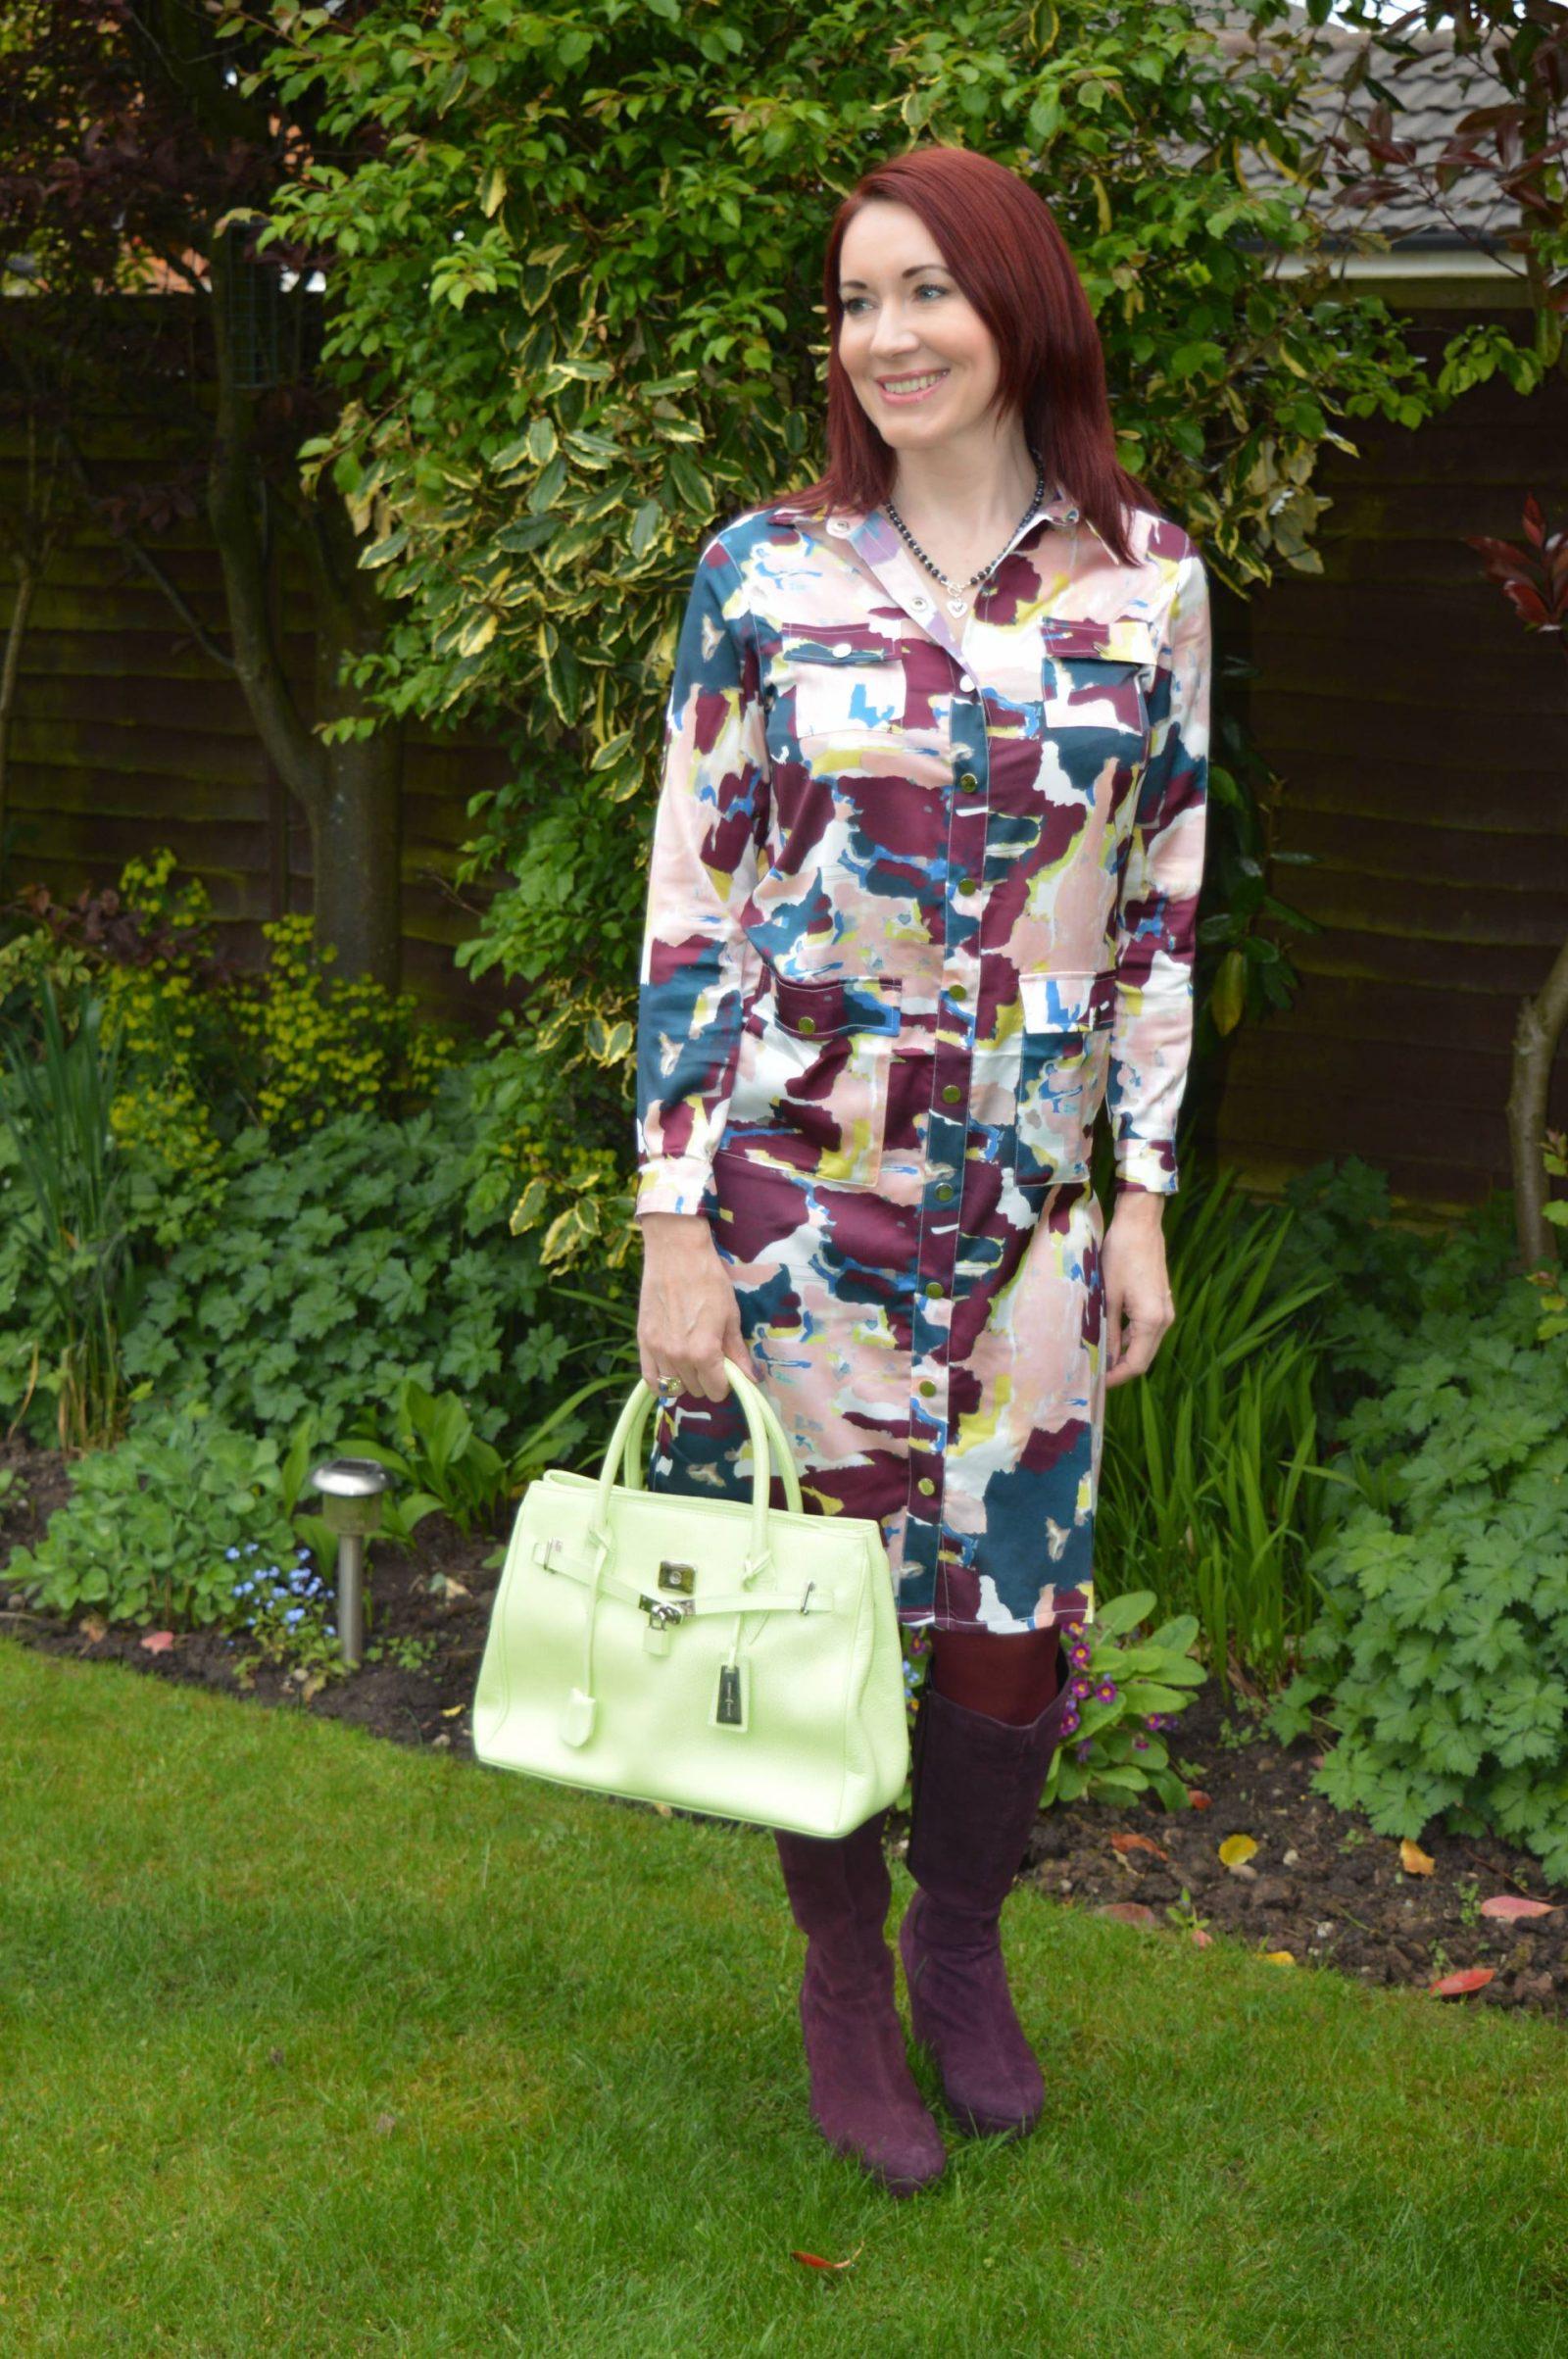 finery-shirt-dress-green-jasper-conran-leather-bag